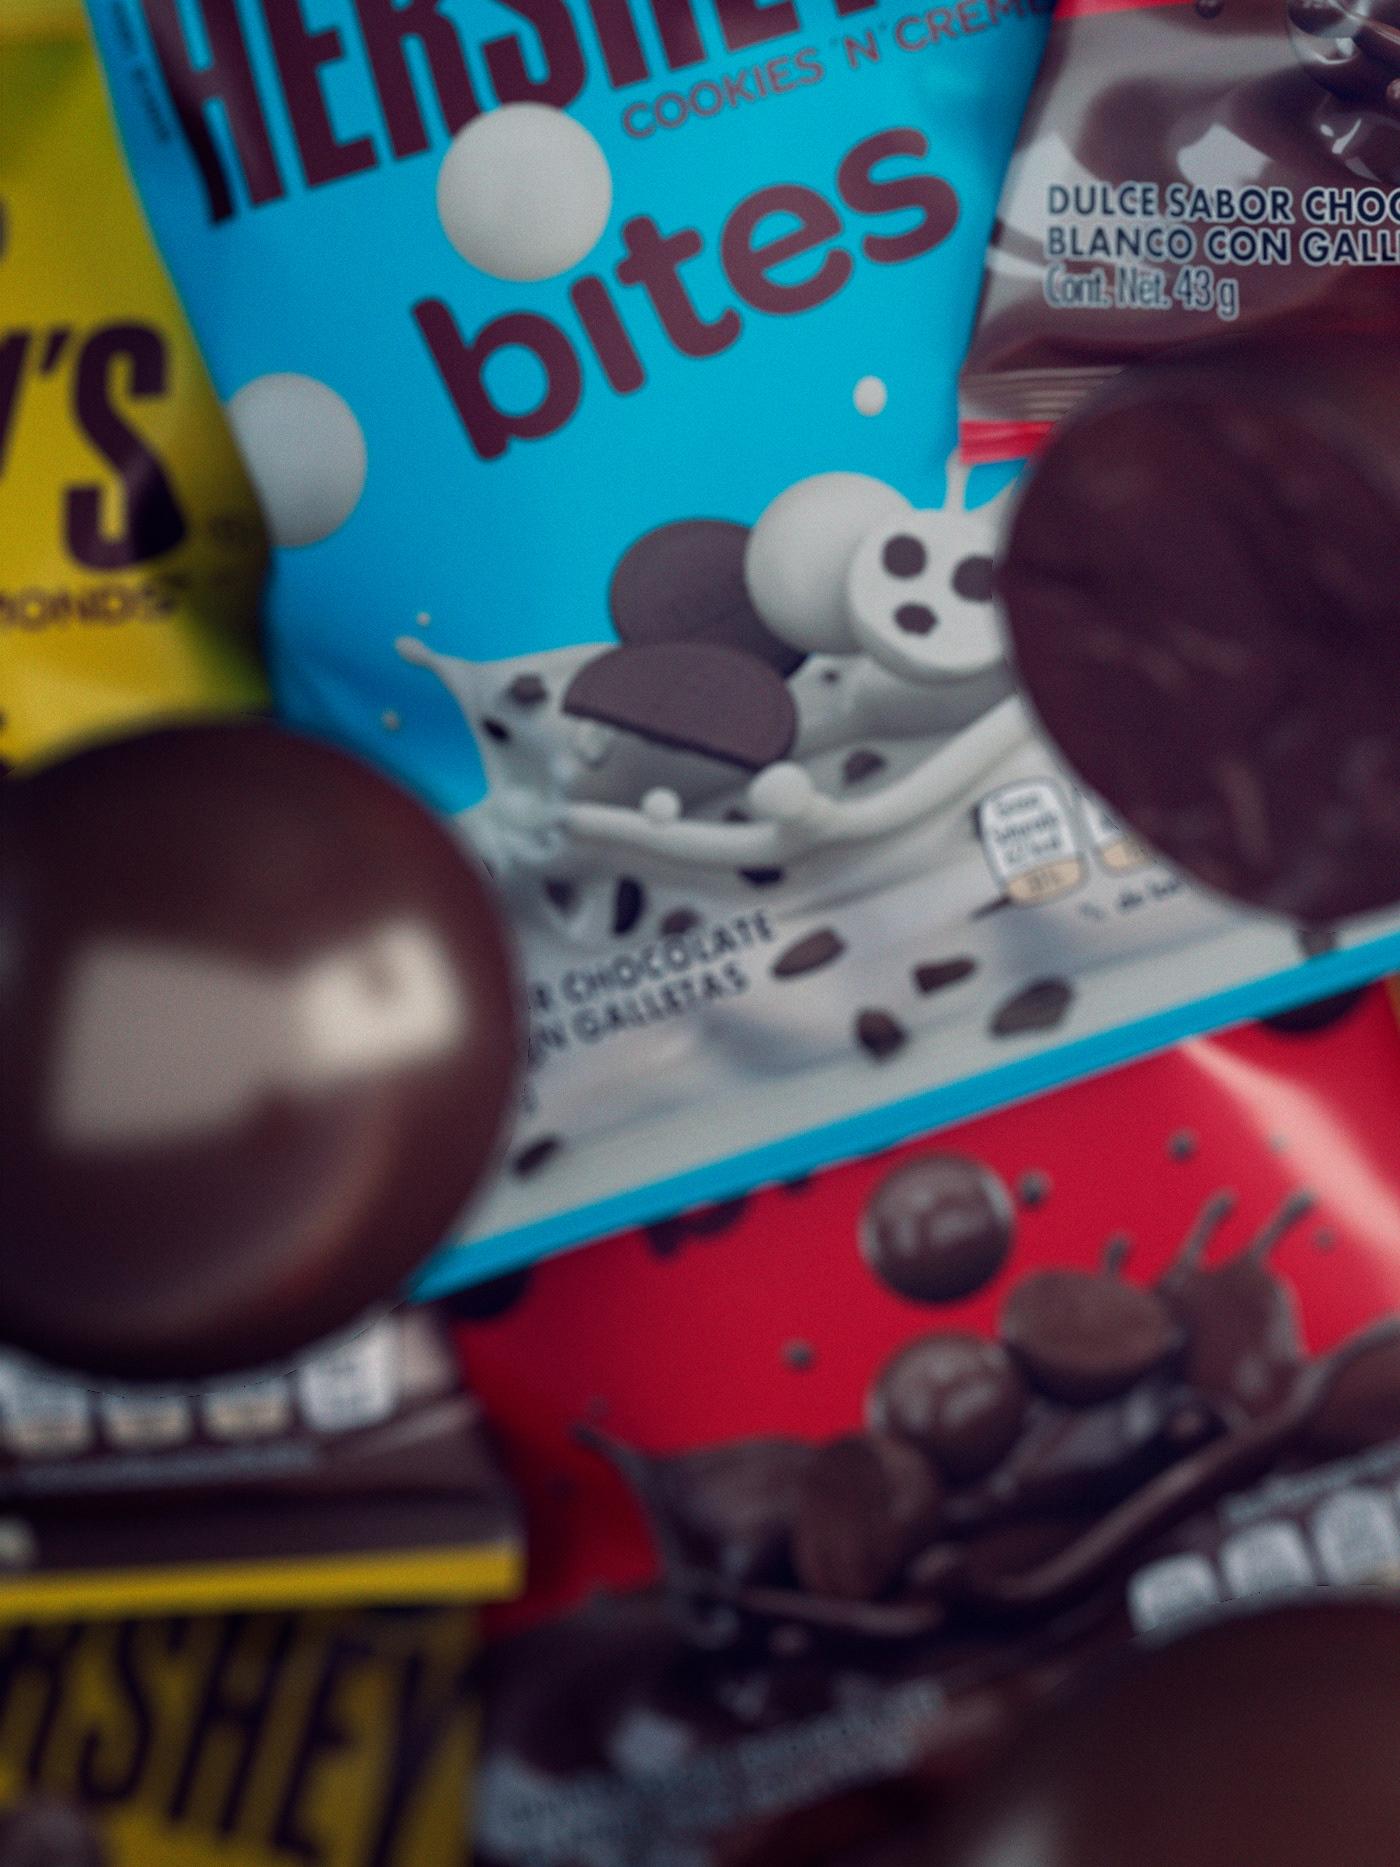 CGI 3D chocolate hersheys bites dessert Candy vray mexico photoshoot